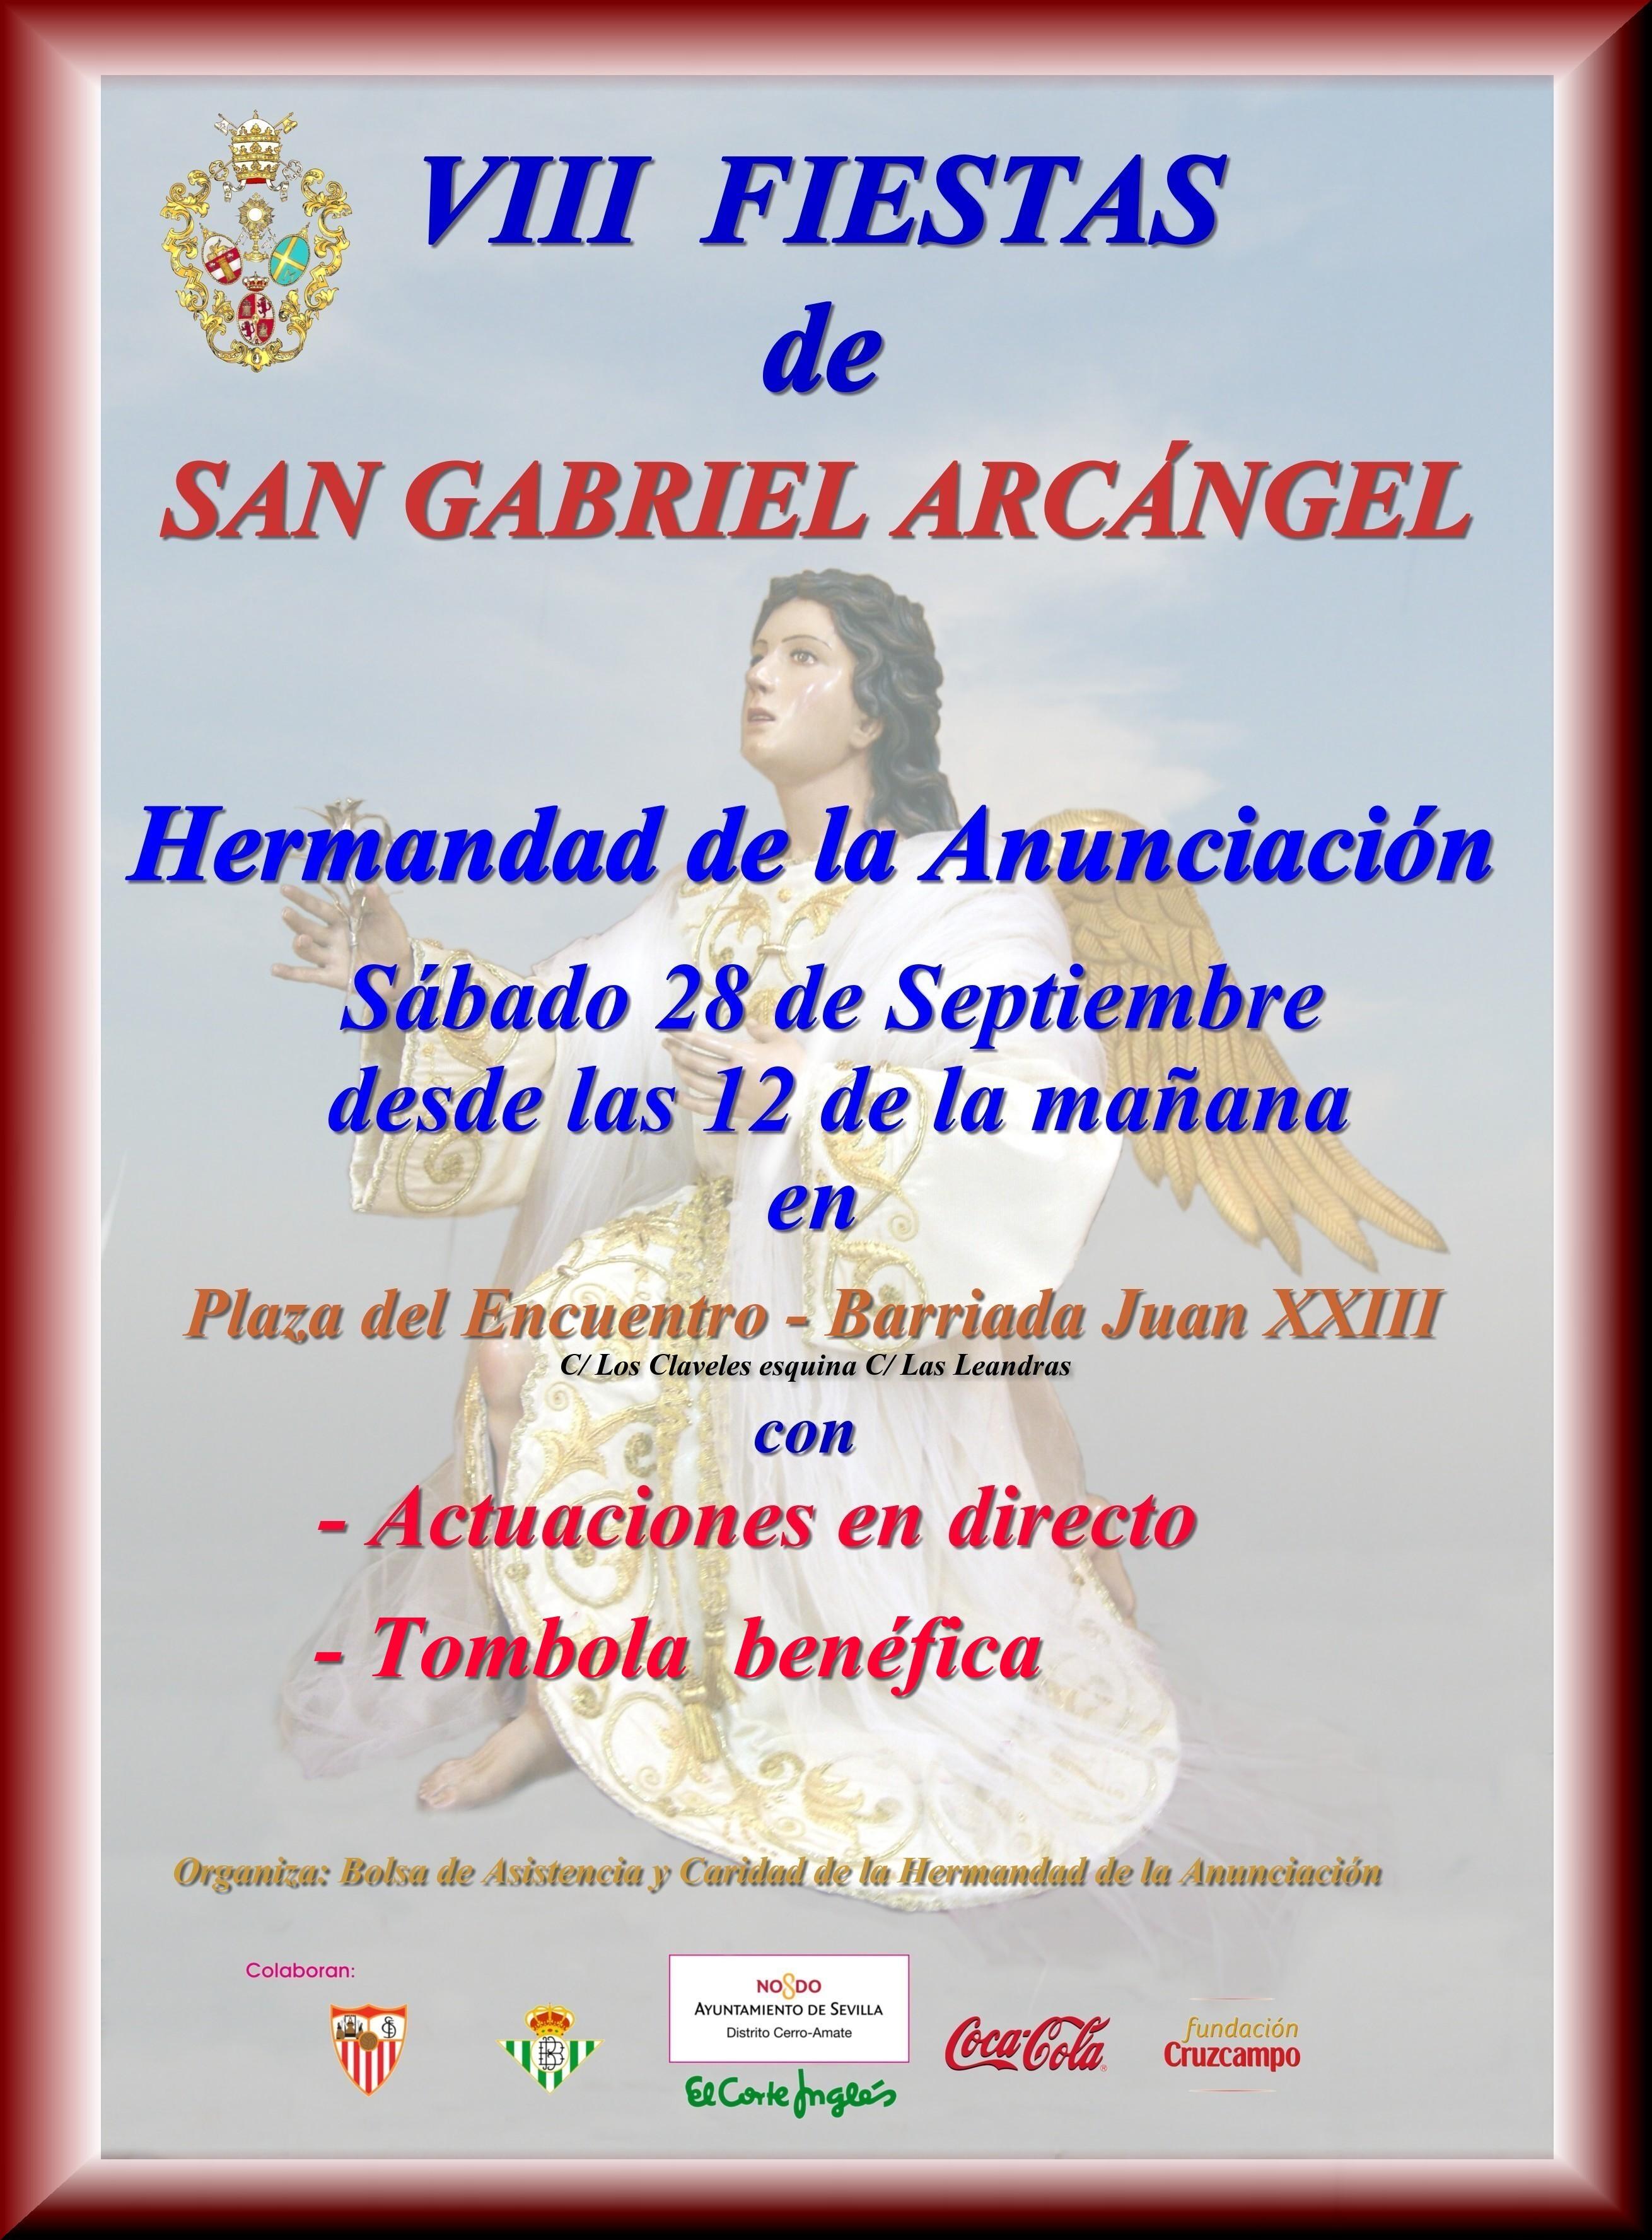 VIII Fiestas de San Gabriel